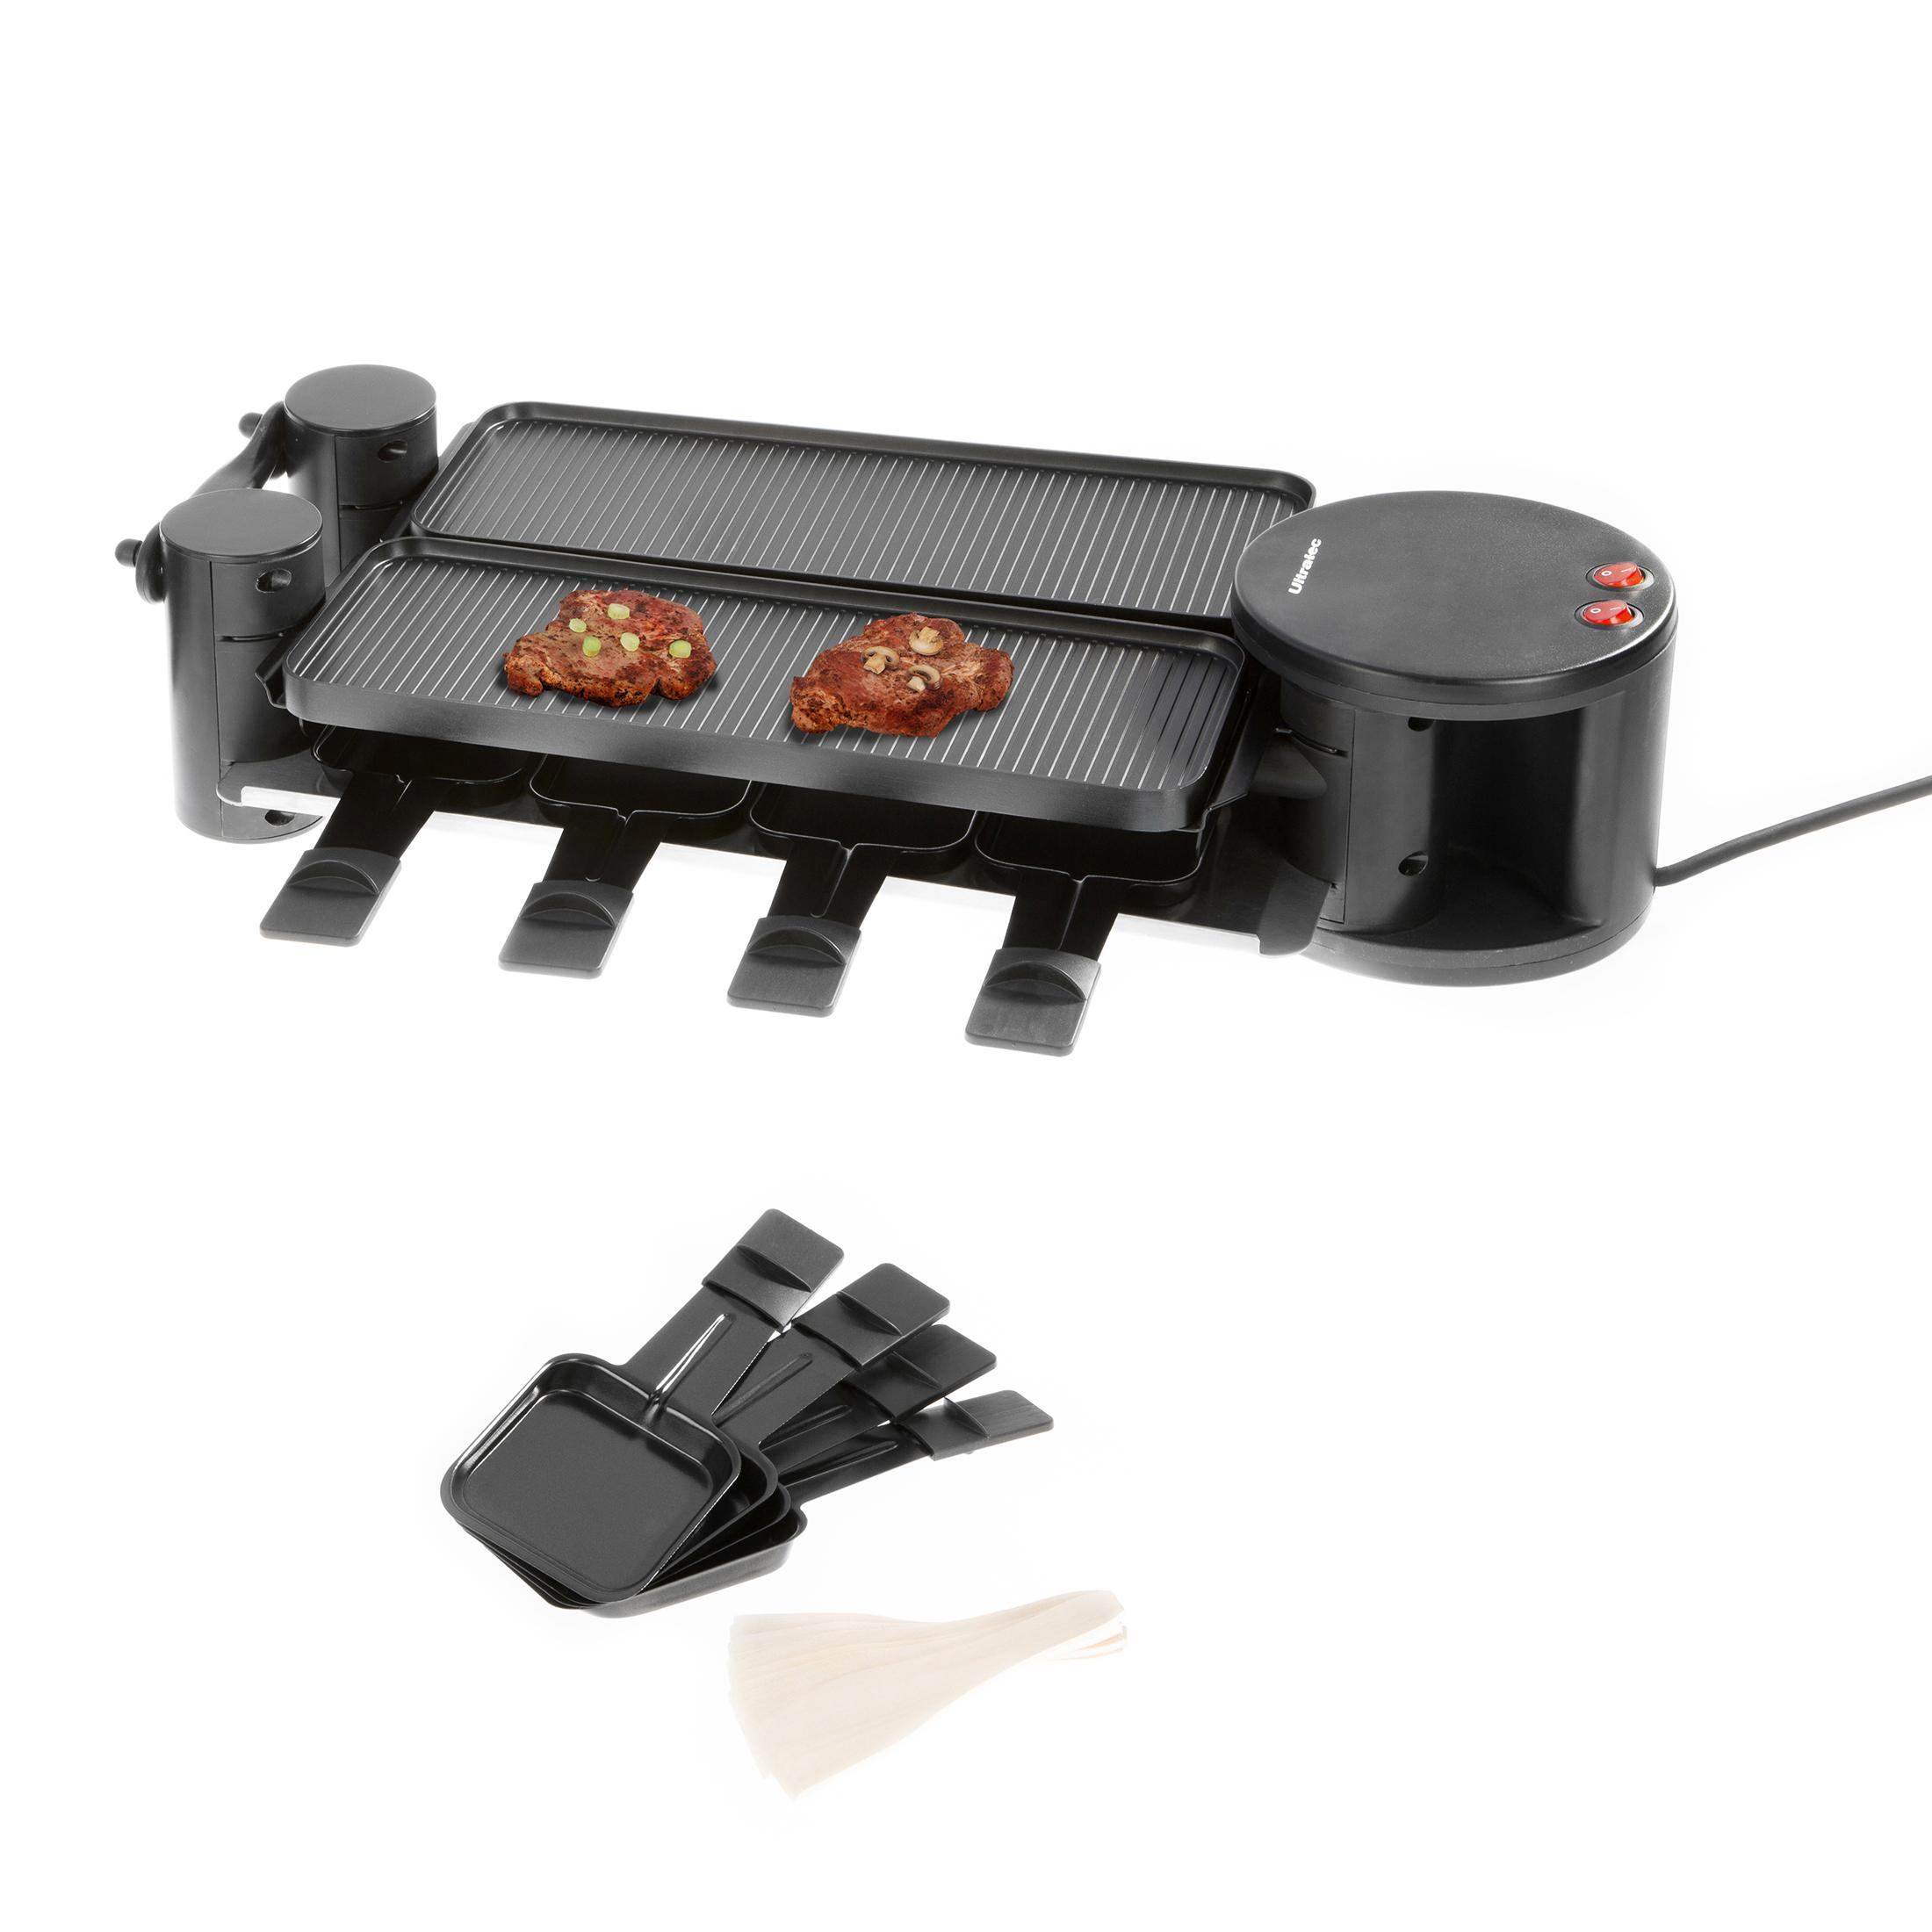 ultratec cuisine 331400000127 rg1200 raclette gril articul duo 4 four raclette pour 8. Black Bedroom Furniture Sets. Home Design Ideas